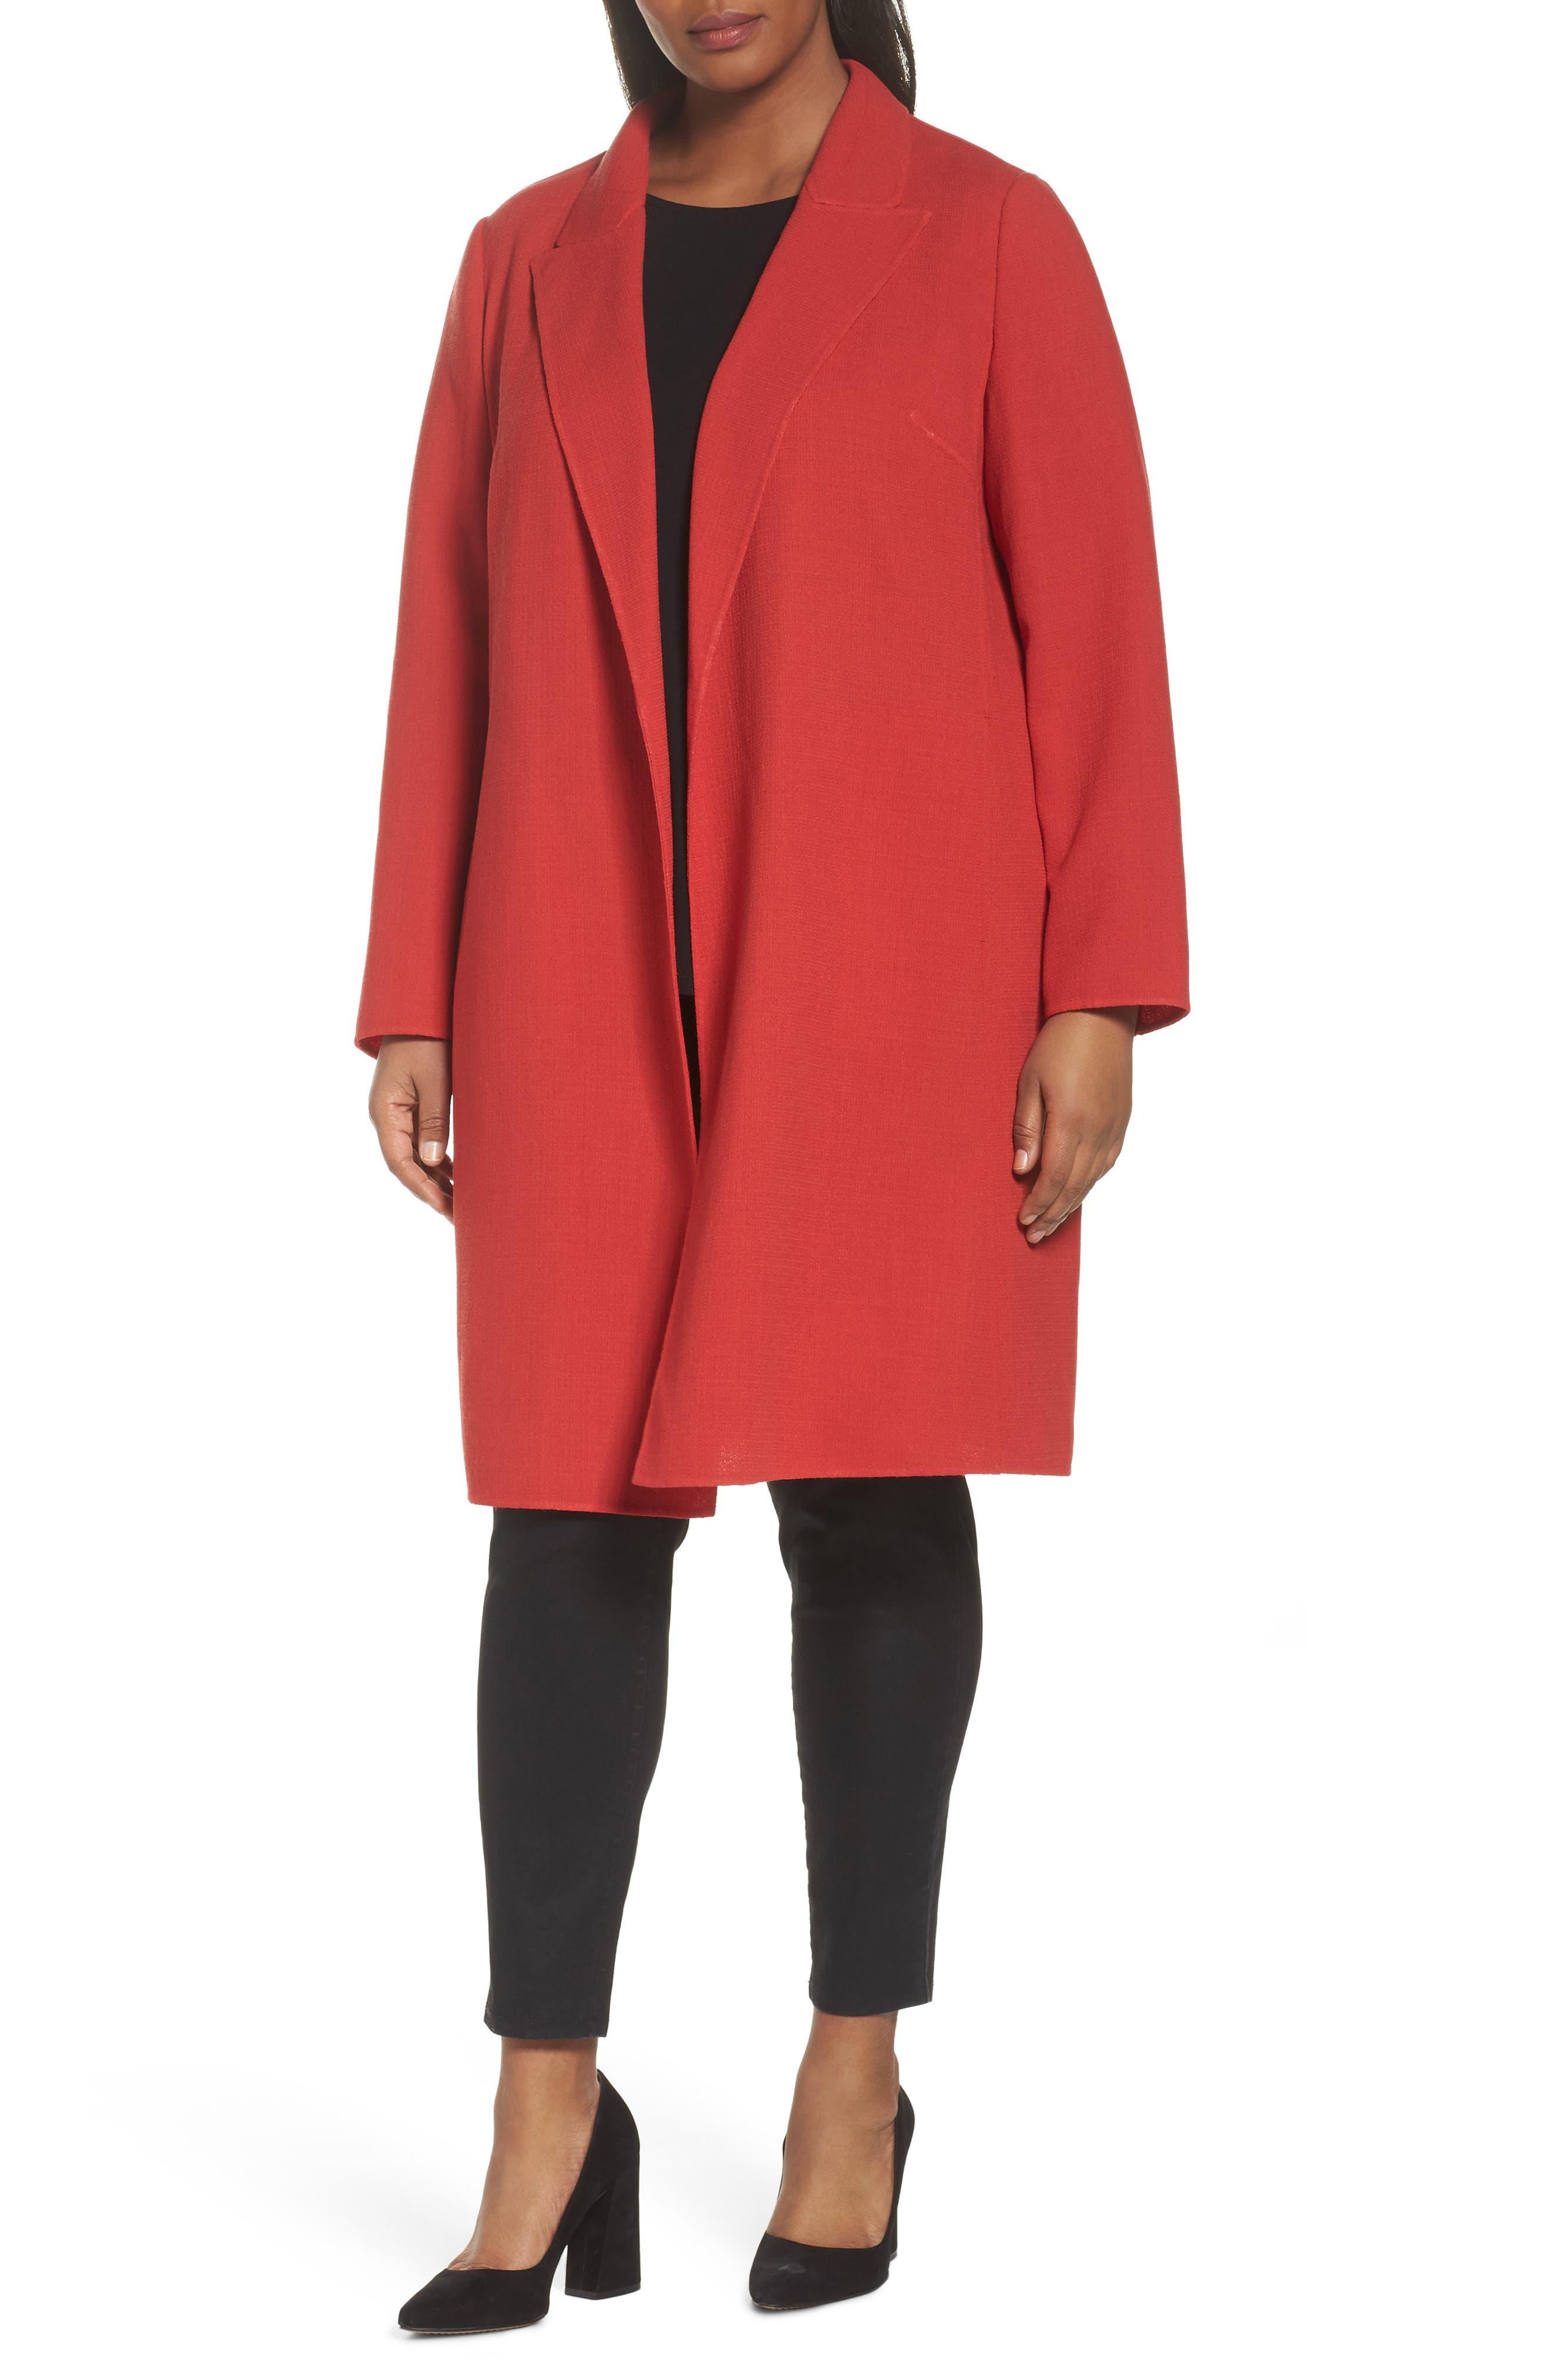 Alternate Image 1 Selected - Lafayette 148 New York Carmelle Nouveau Crepe Jacket (Plus Size)